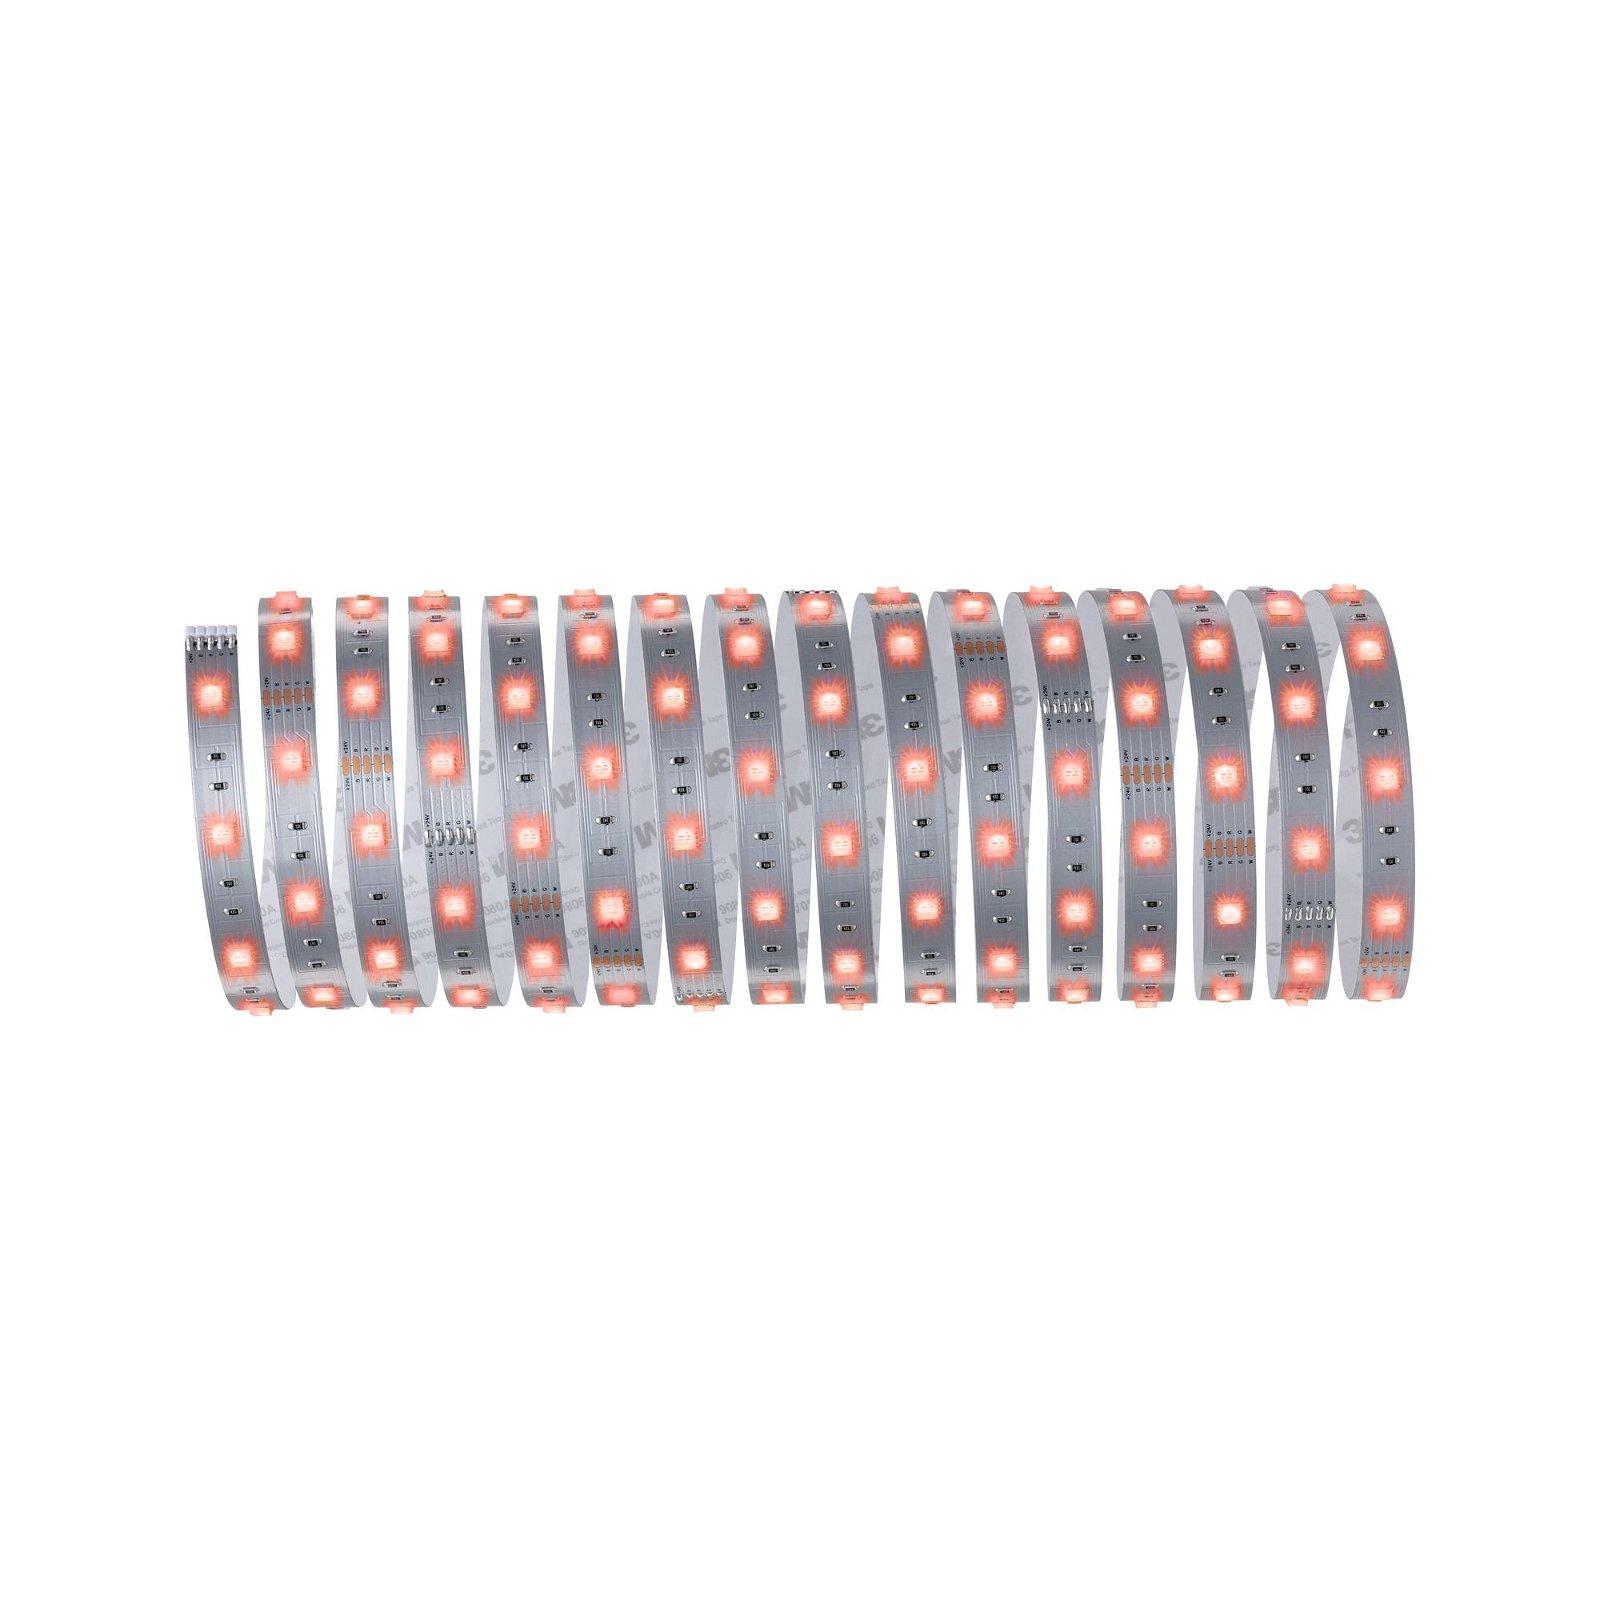 MaxLED 250 LED Strip RGBW 5m 31,5W 1350lm RGBW